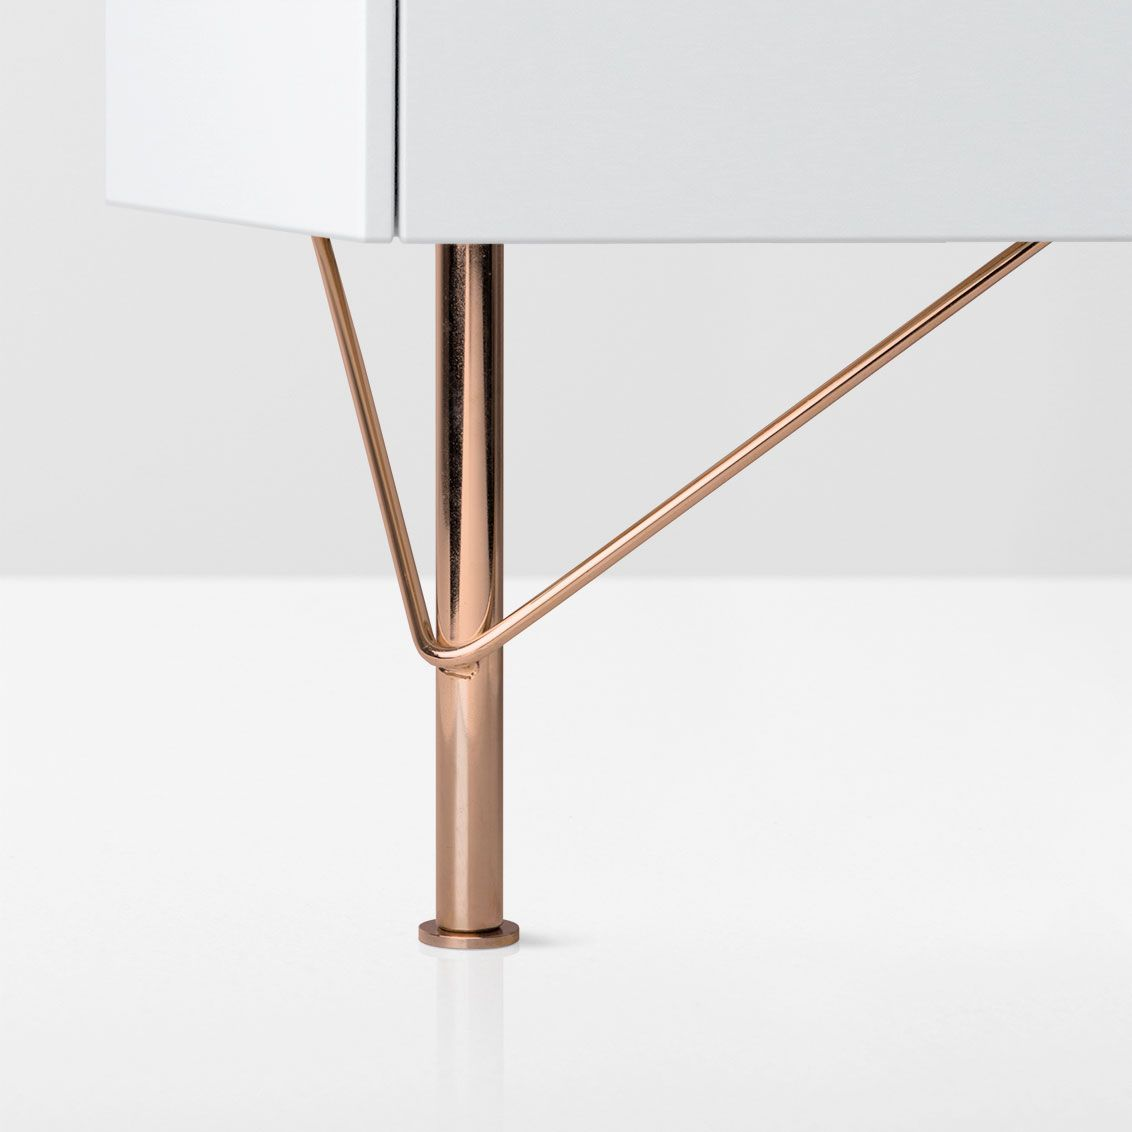 Slender Low Metal Furniture Legs Brass Furniture Legs